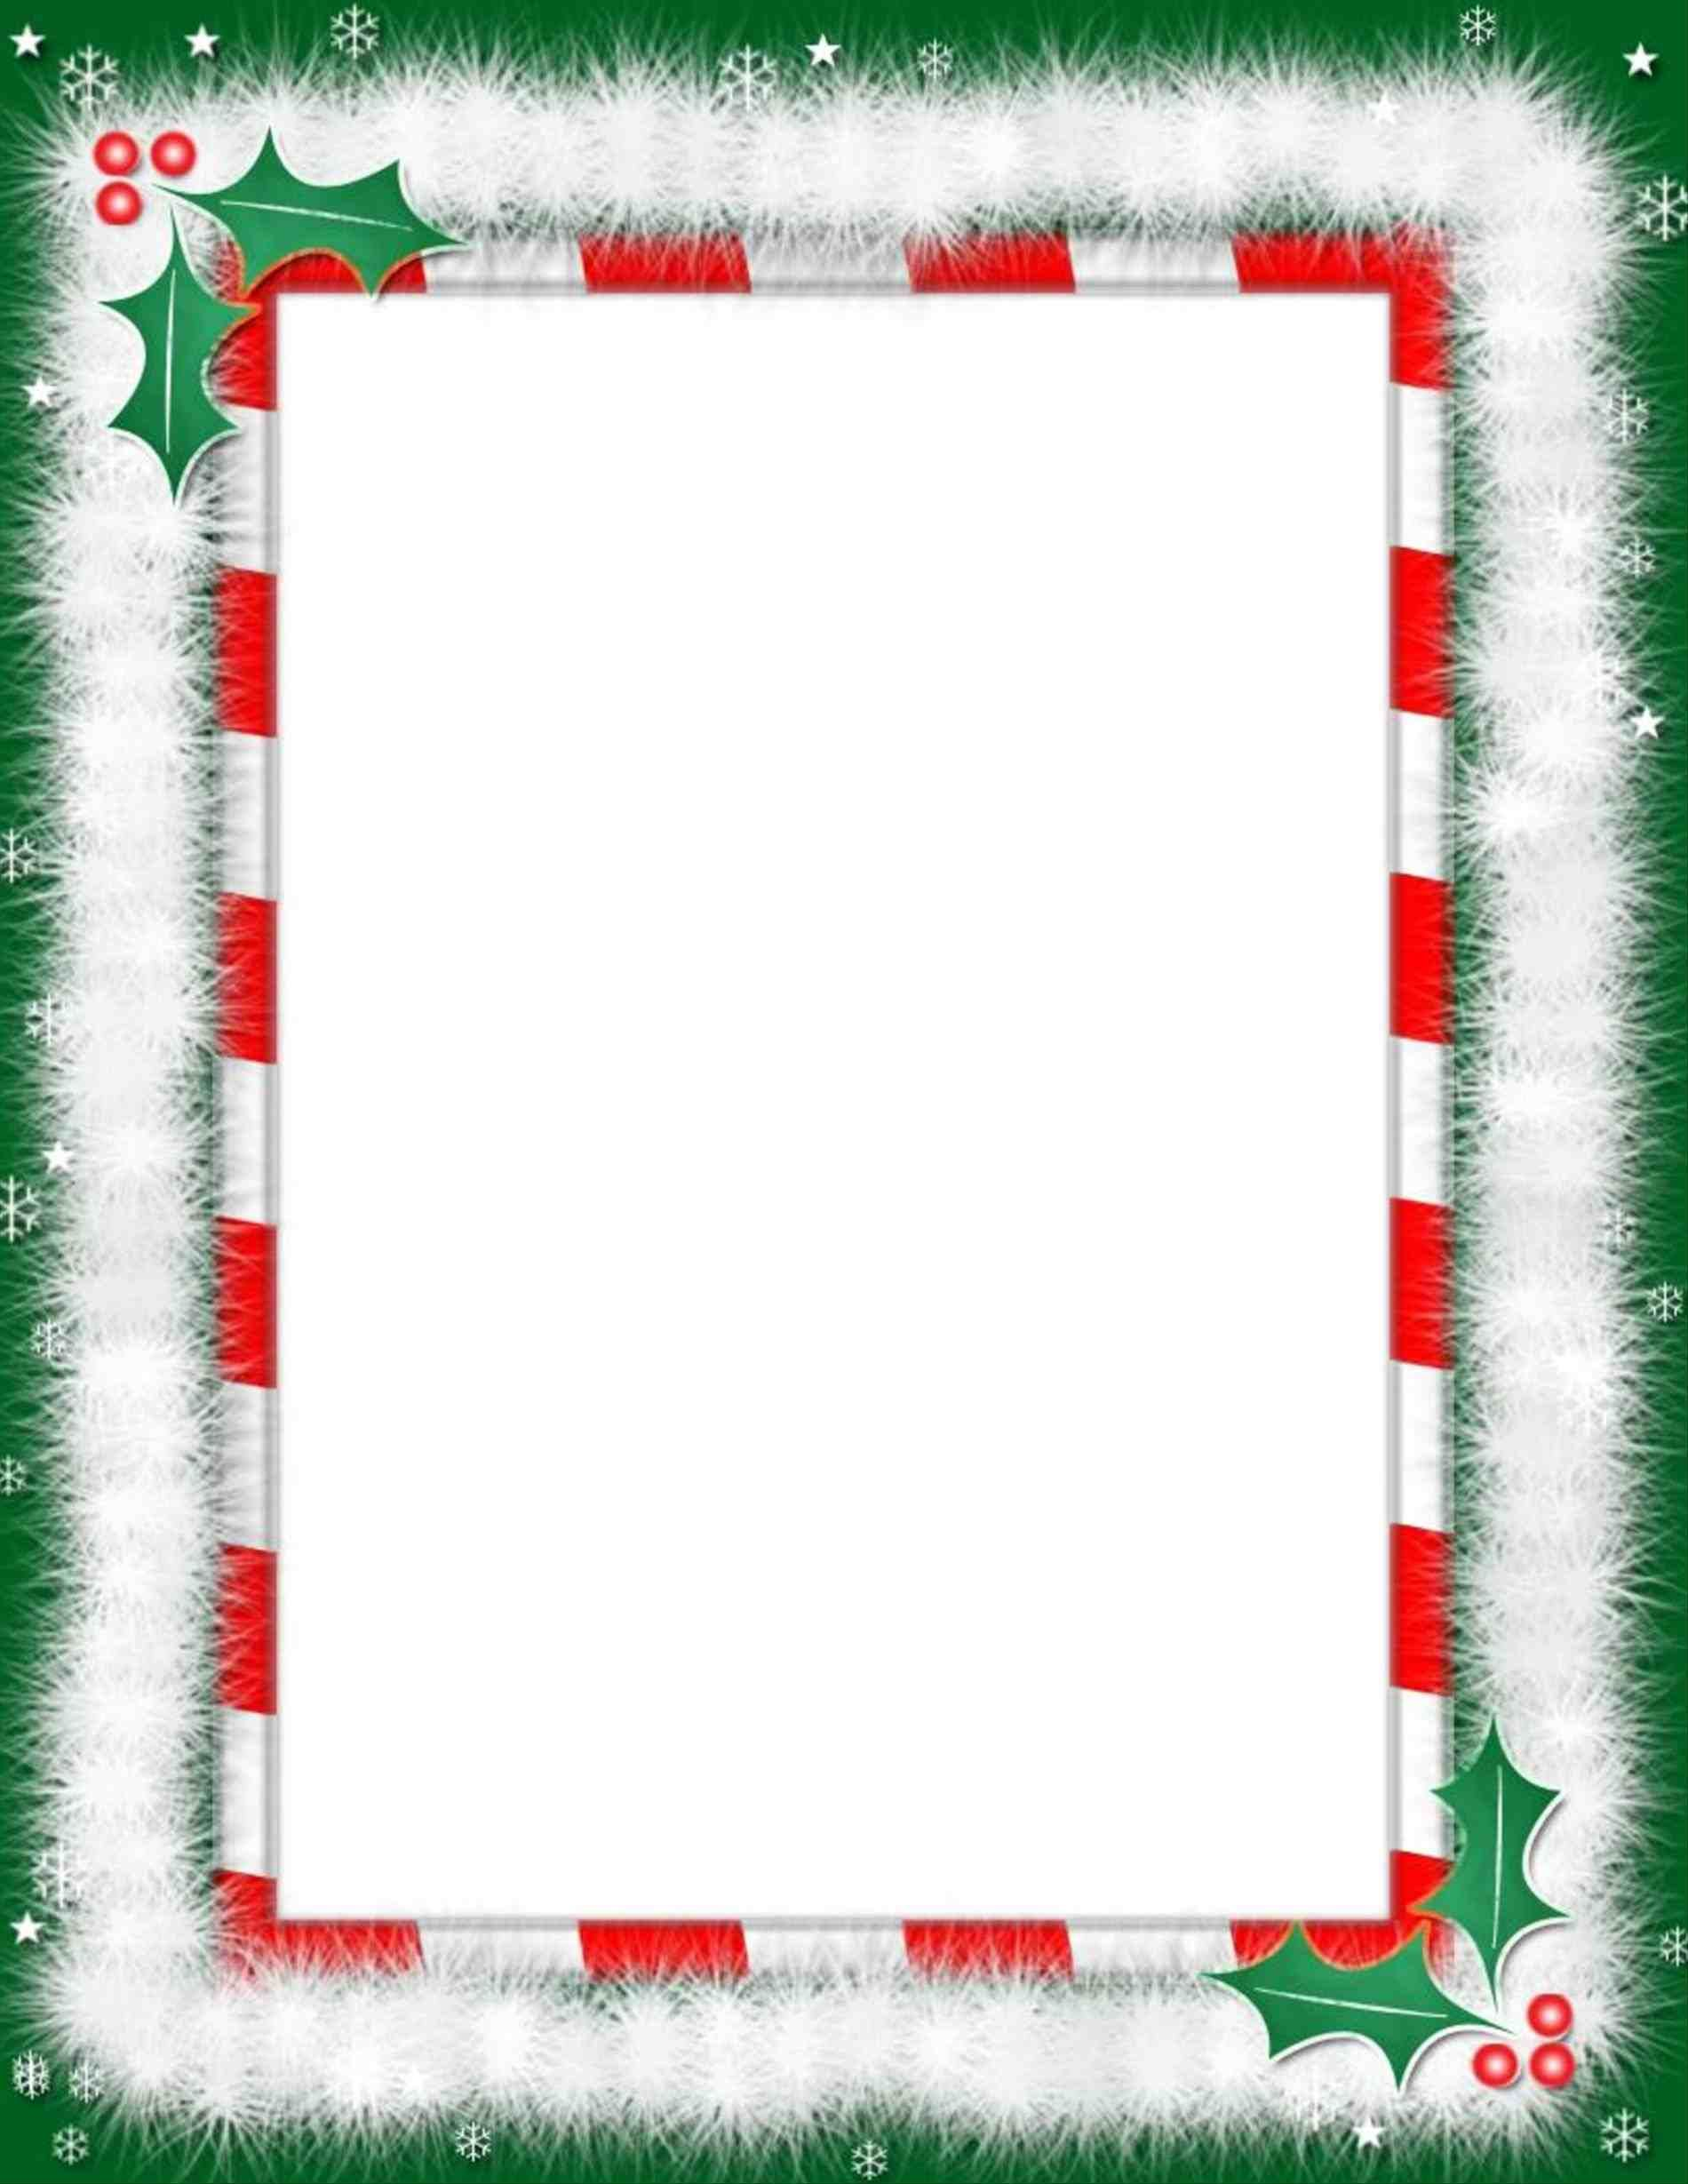 Christmas Page Borders.Christmas Page Border Landscape Baby Its Christmas